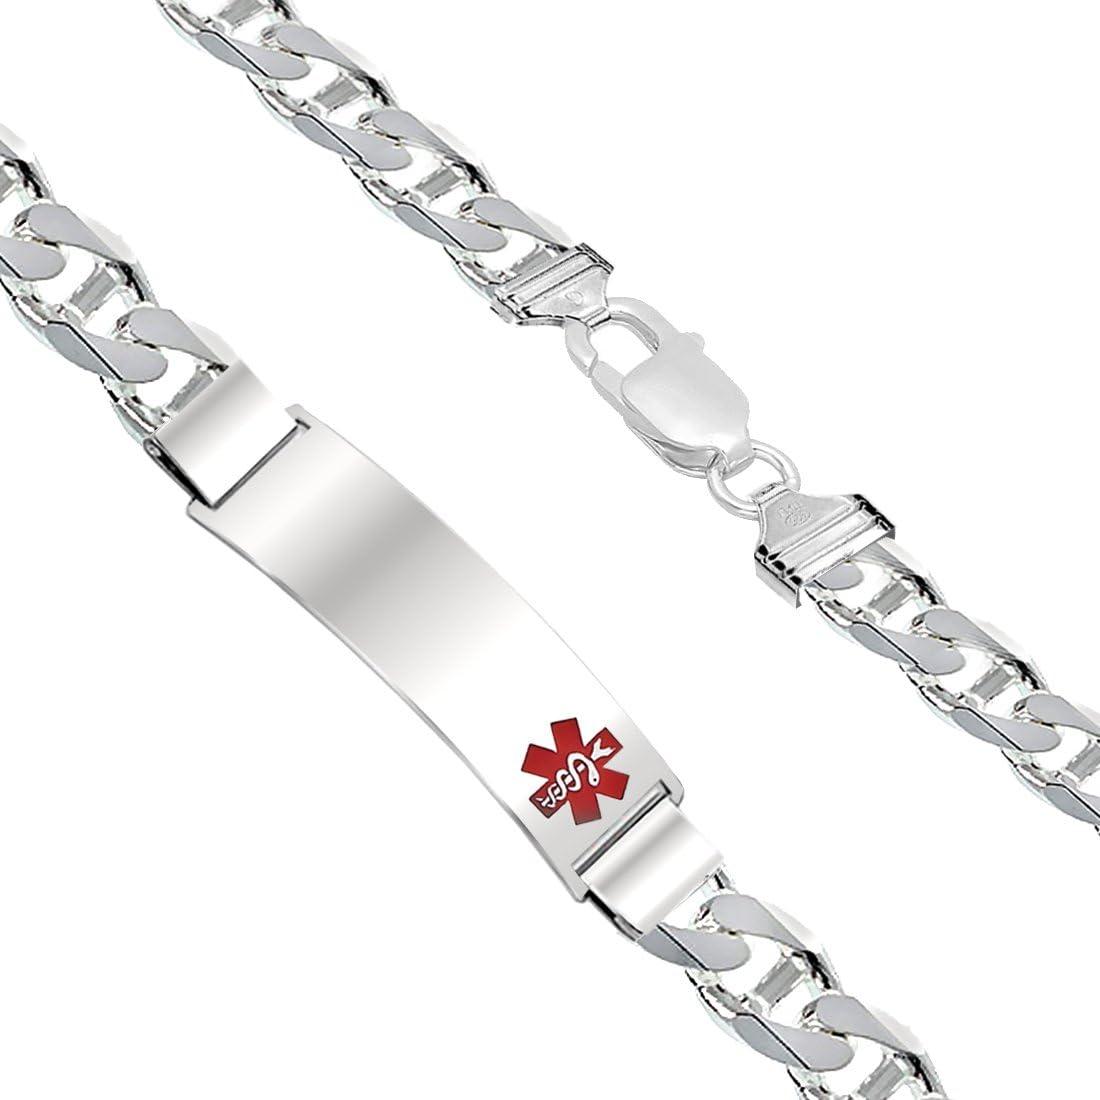 Sterling Silver Rhod-plated Childrens Medical ID Anchor Link Bracelet Length 6